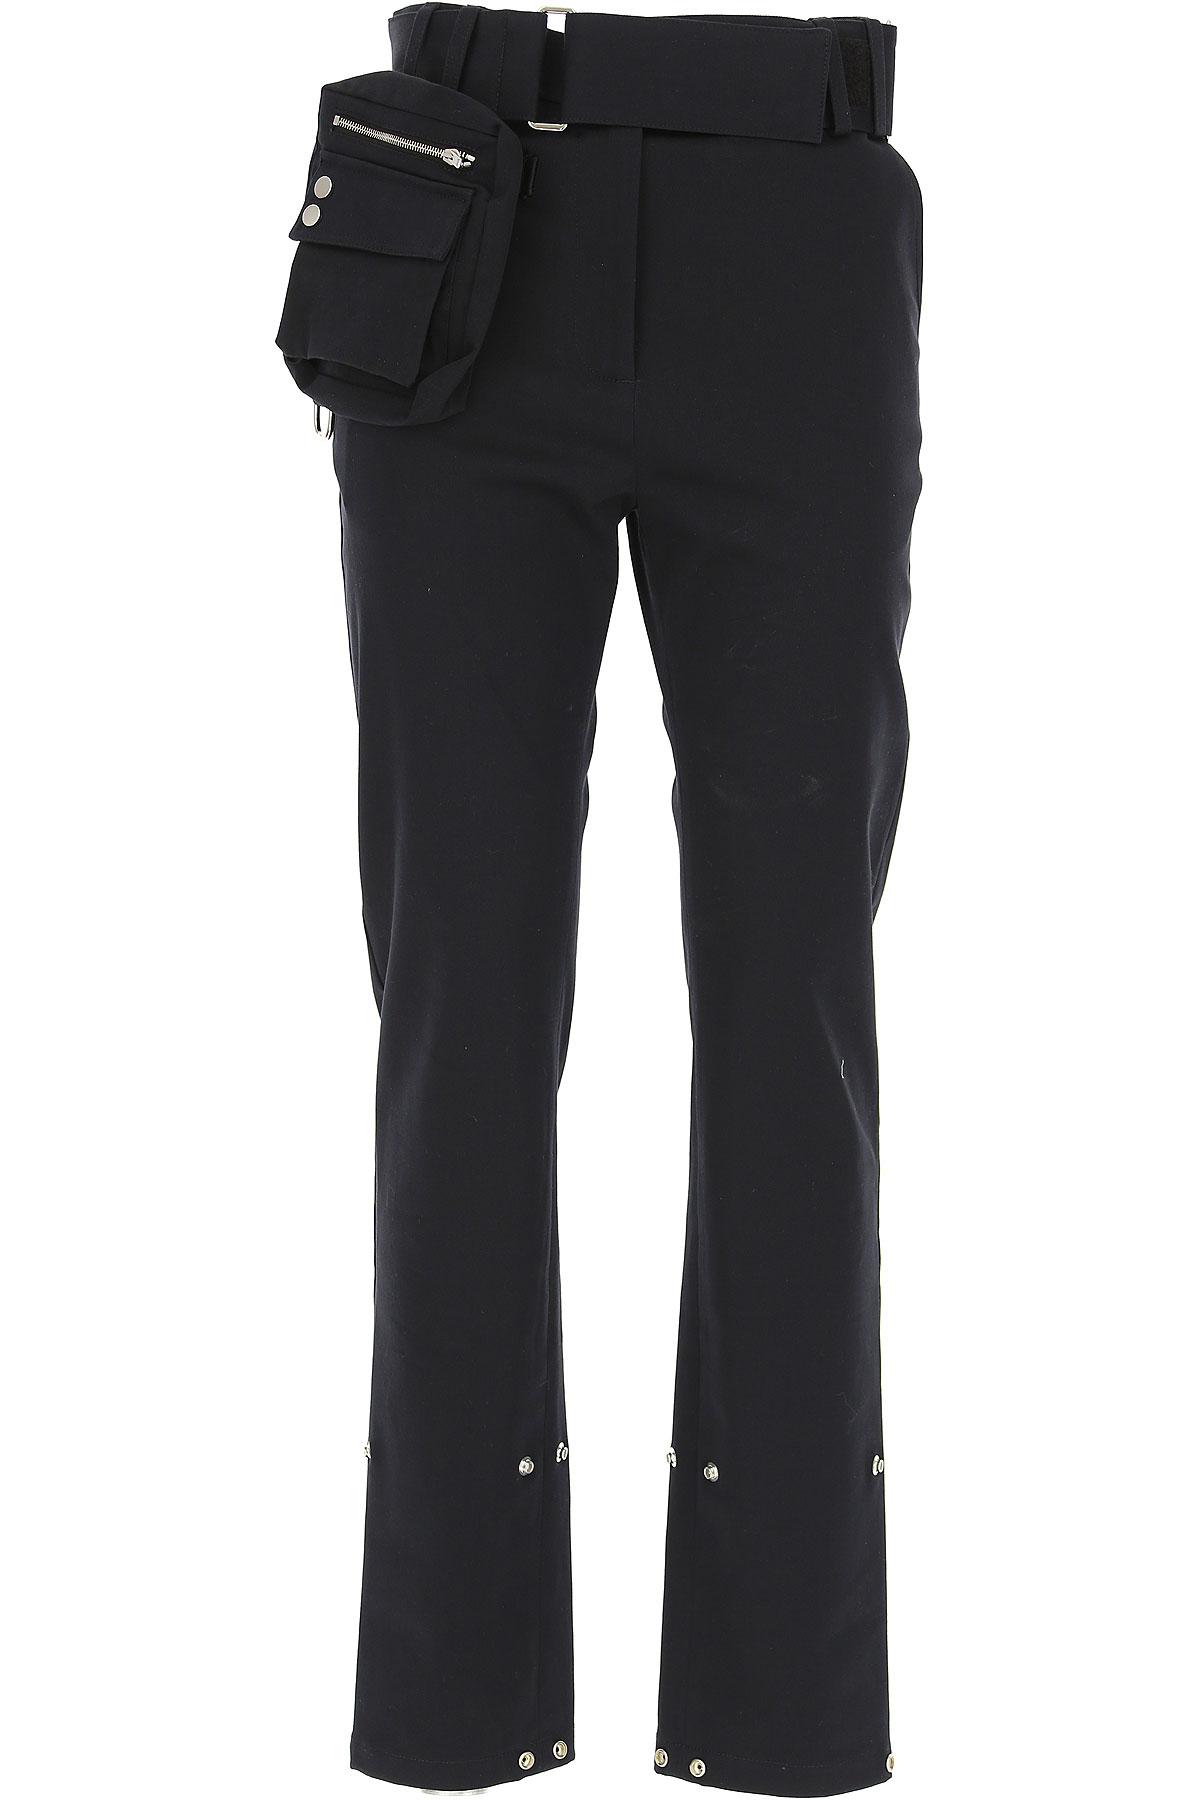 Image of ALYX Pants for Women, Black, Cotton, 2017, 2 26